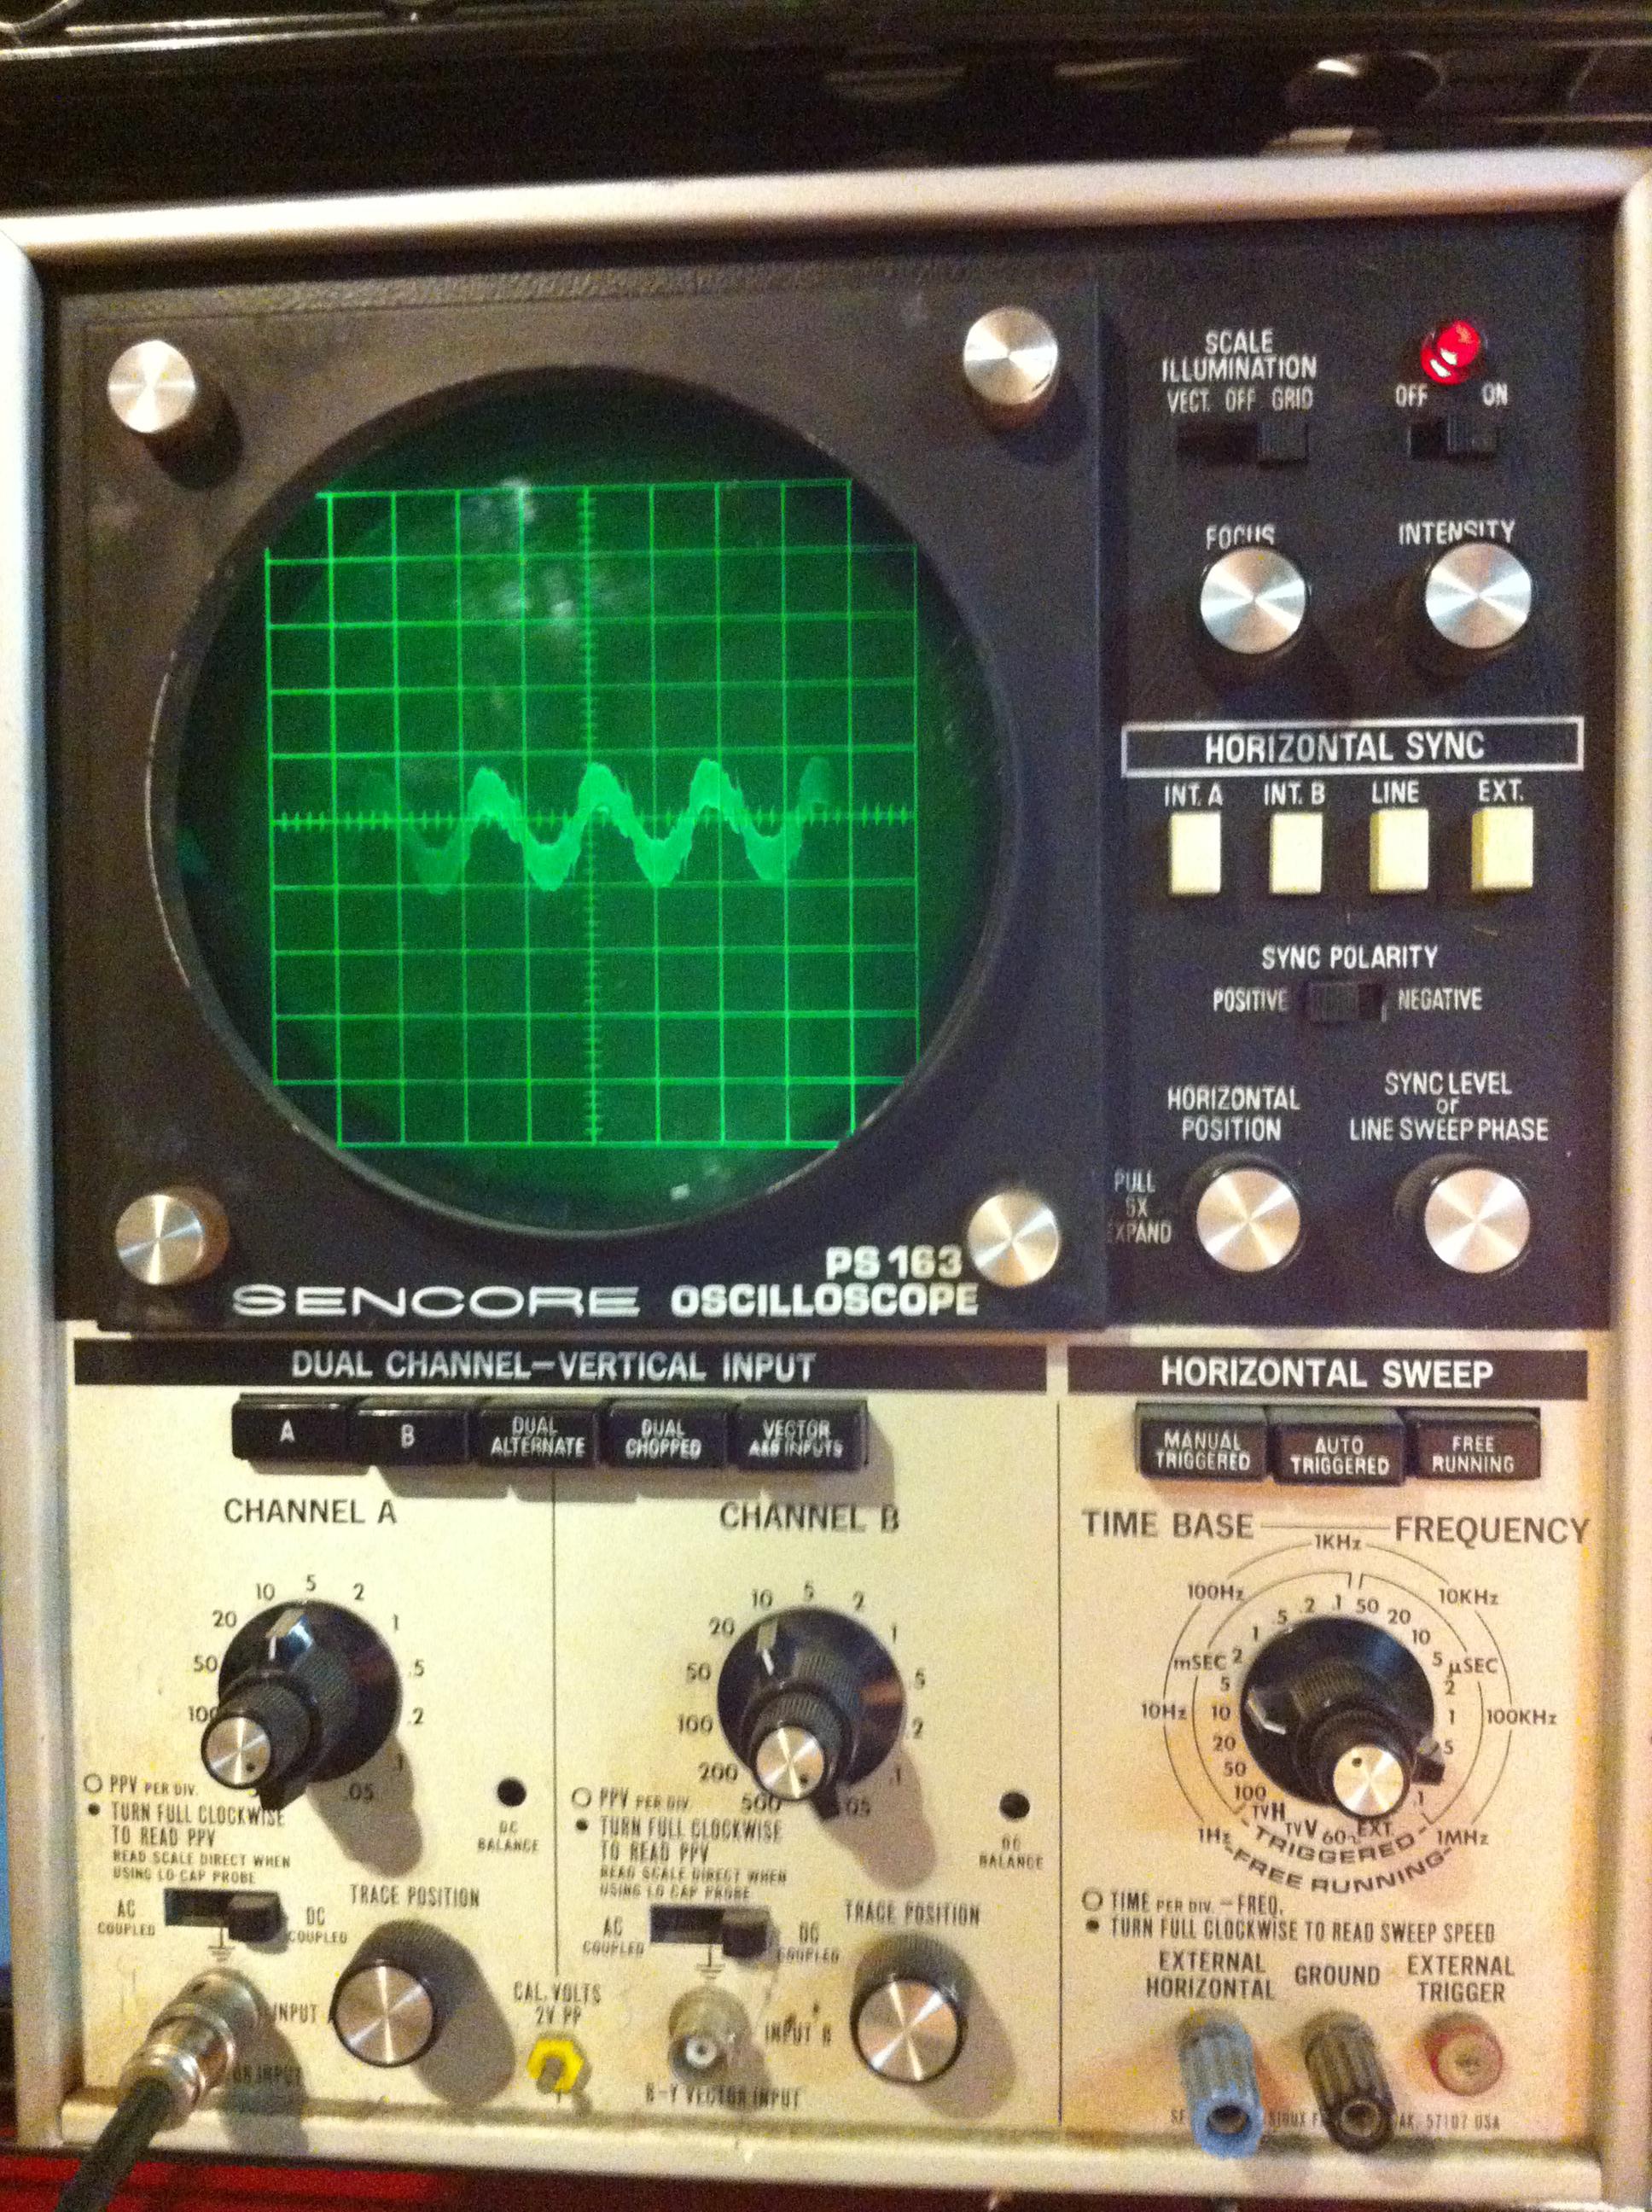 DIY Oscilloscope Leads - I made it at TechShop